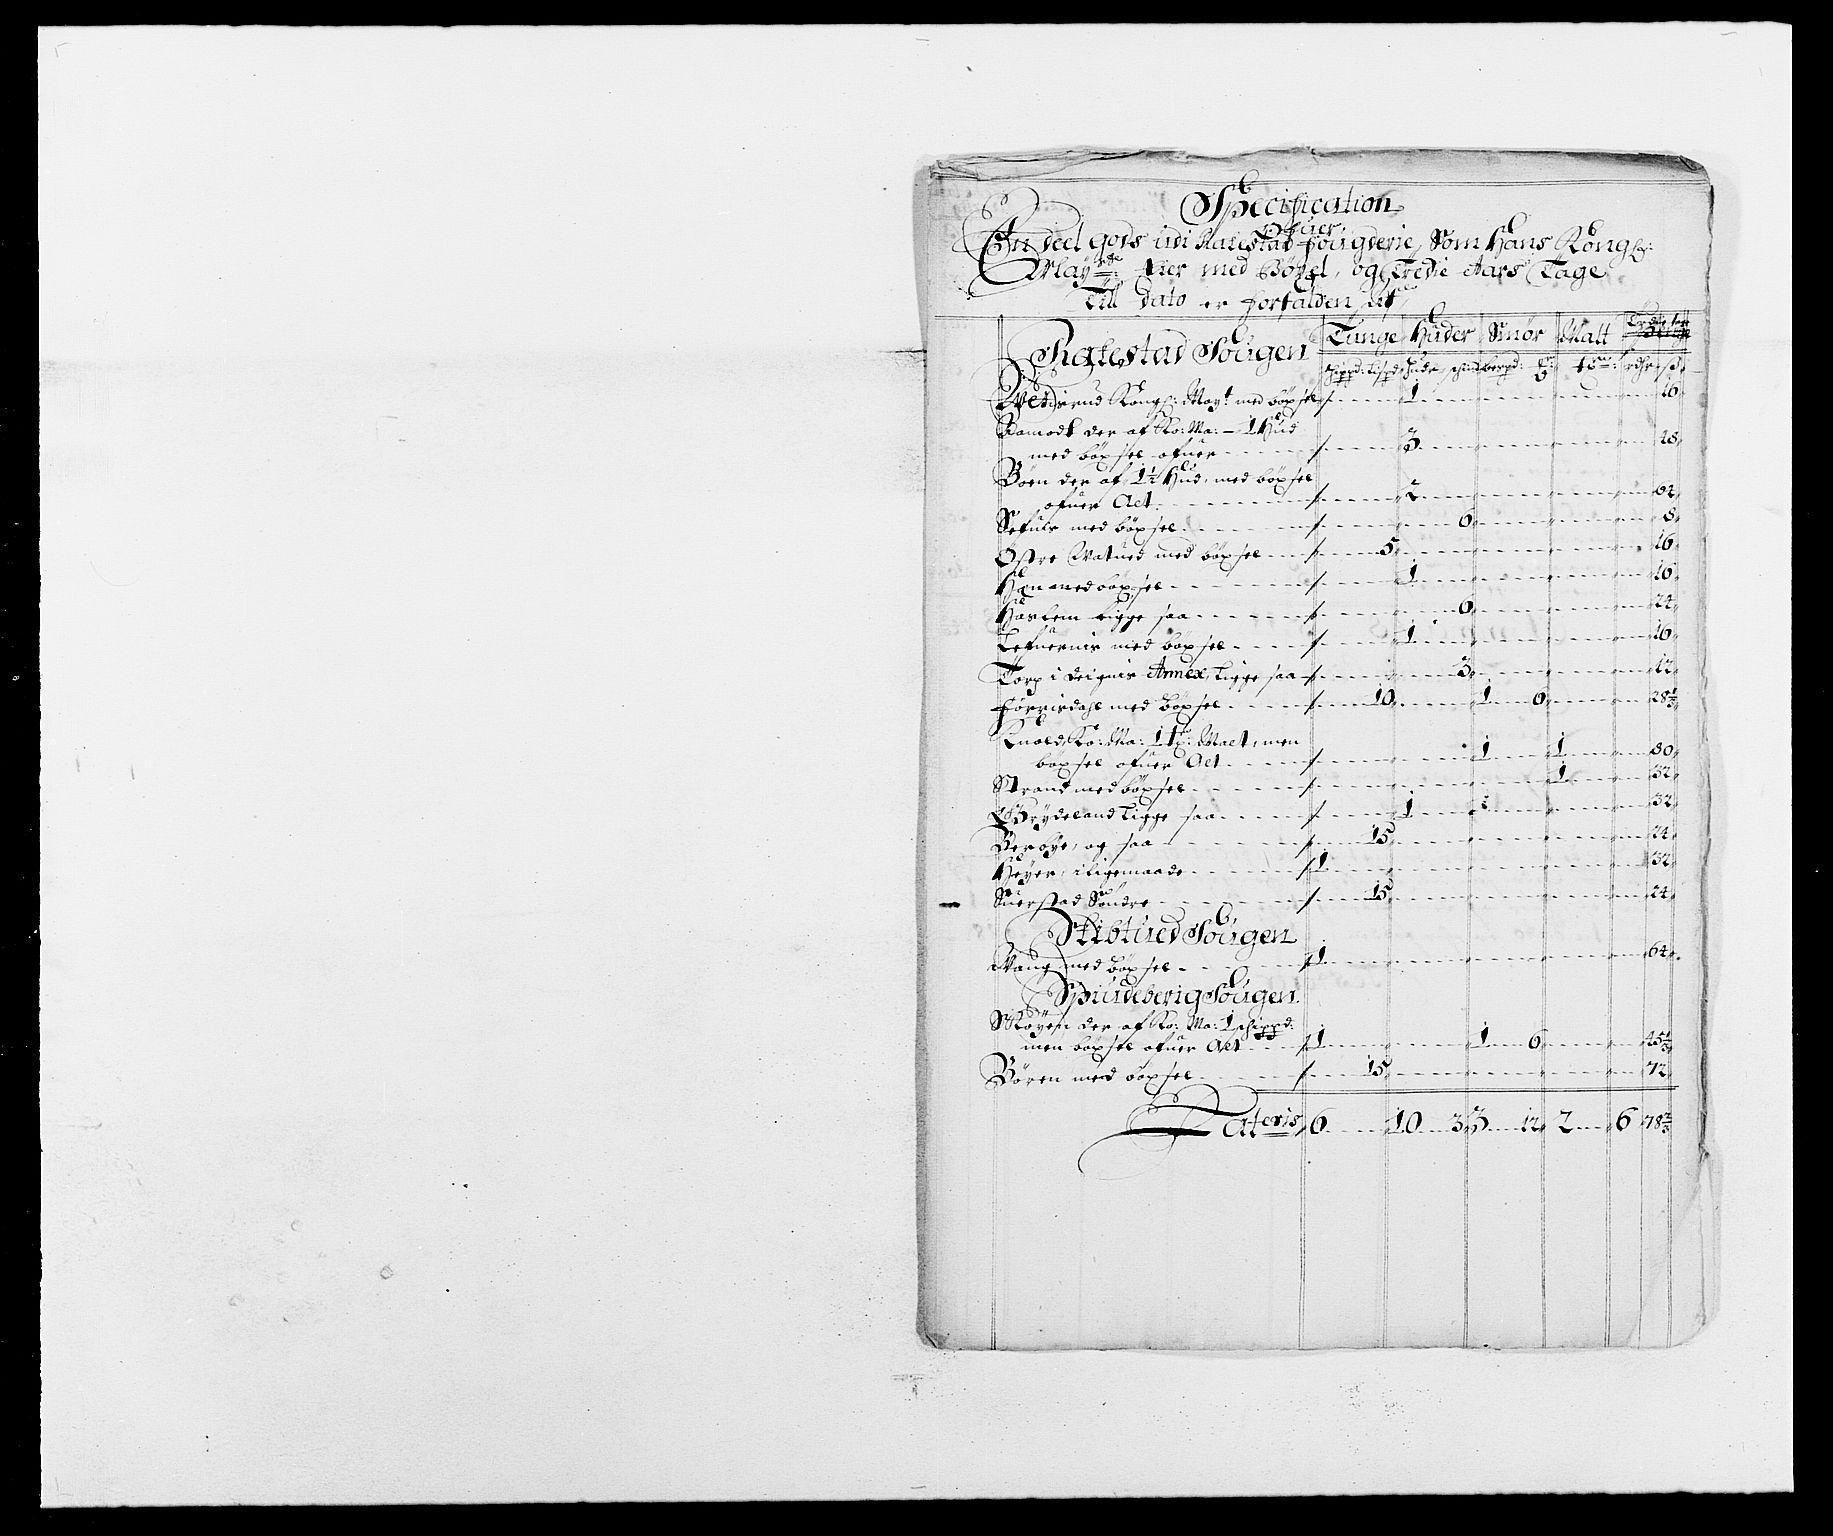 RA, Rentekammeret inntil 1814, Reviderte regnskaper, Fogderegnskap, R05/L0276: Fogderegnskap Rakkestad, 1683-1688, s. 136